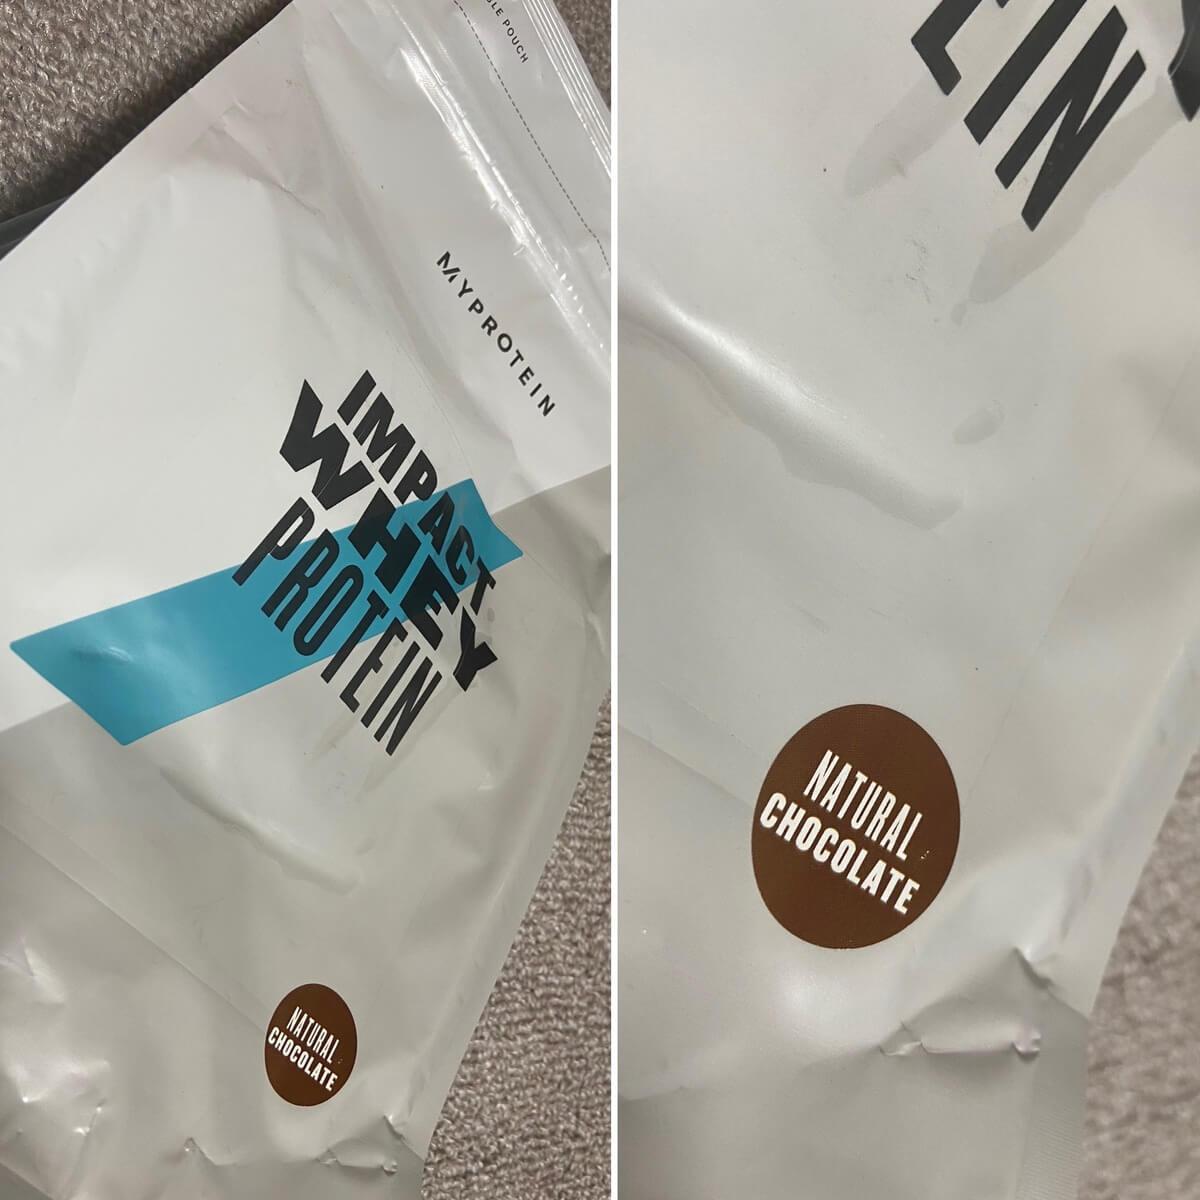 IMPACTホエイプロテイン・ナチュラルチョコレート